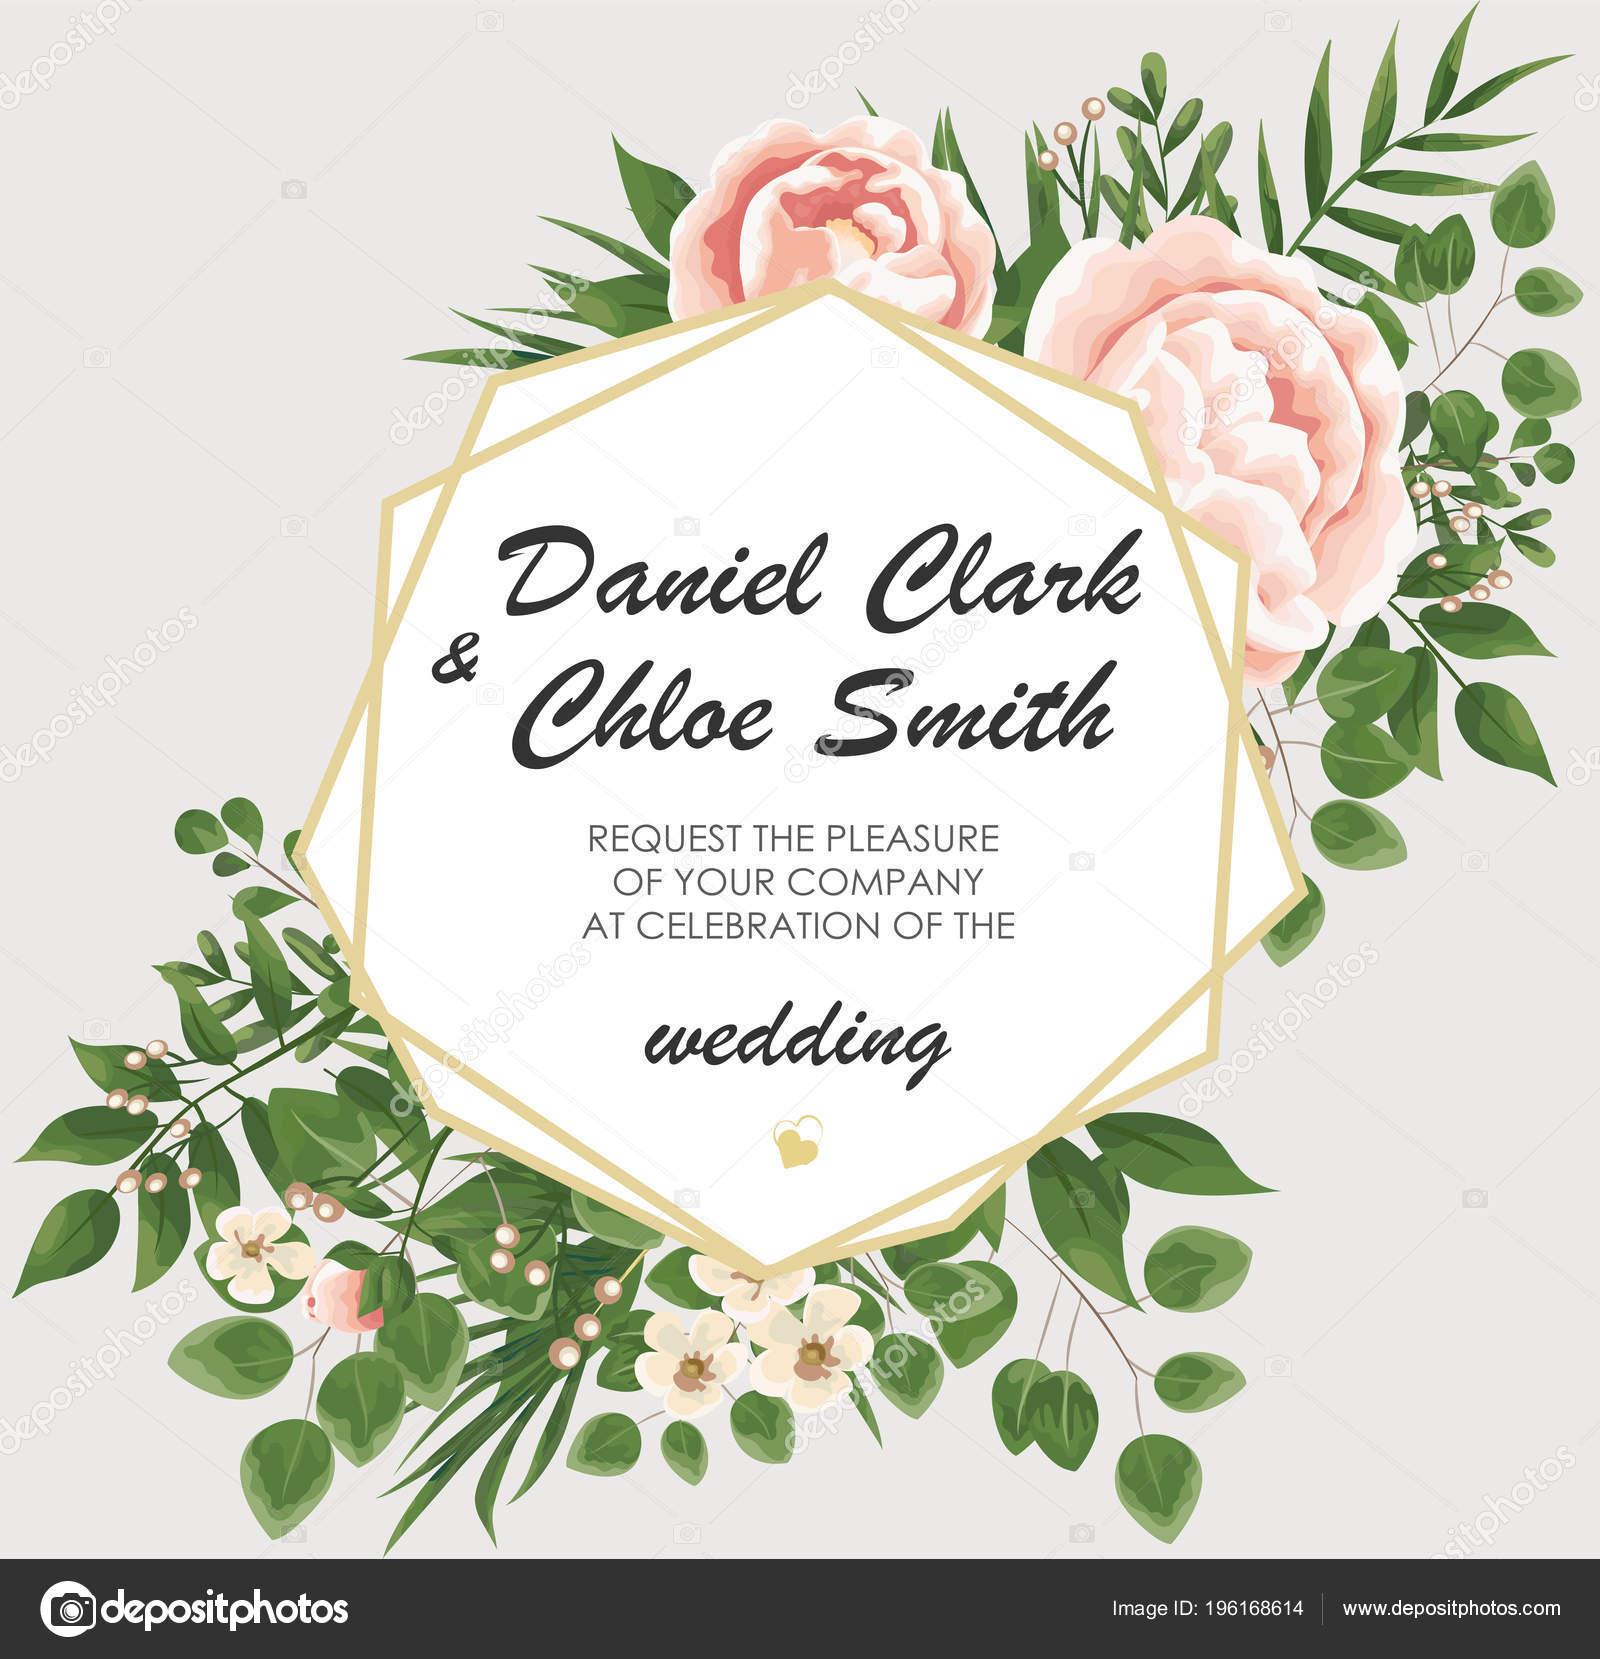 wedding invitation template peonies flowers green leaves rsvp modern